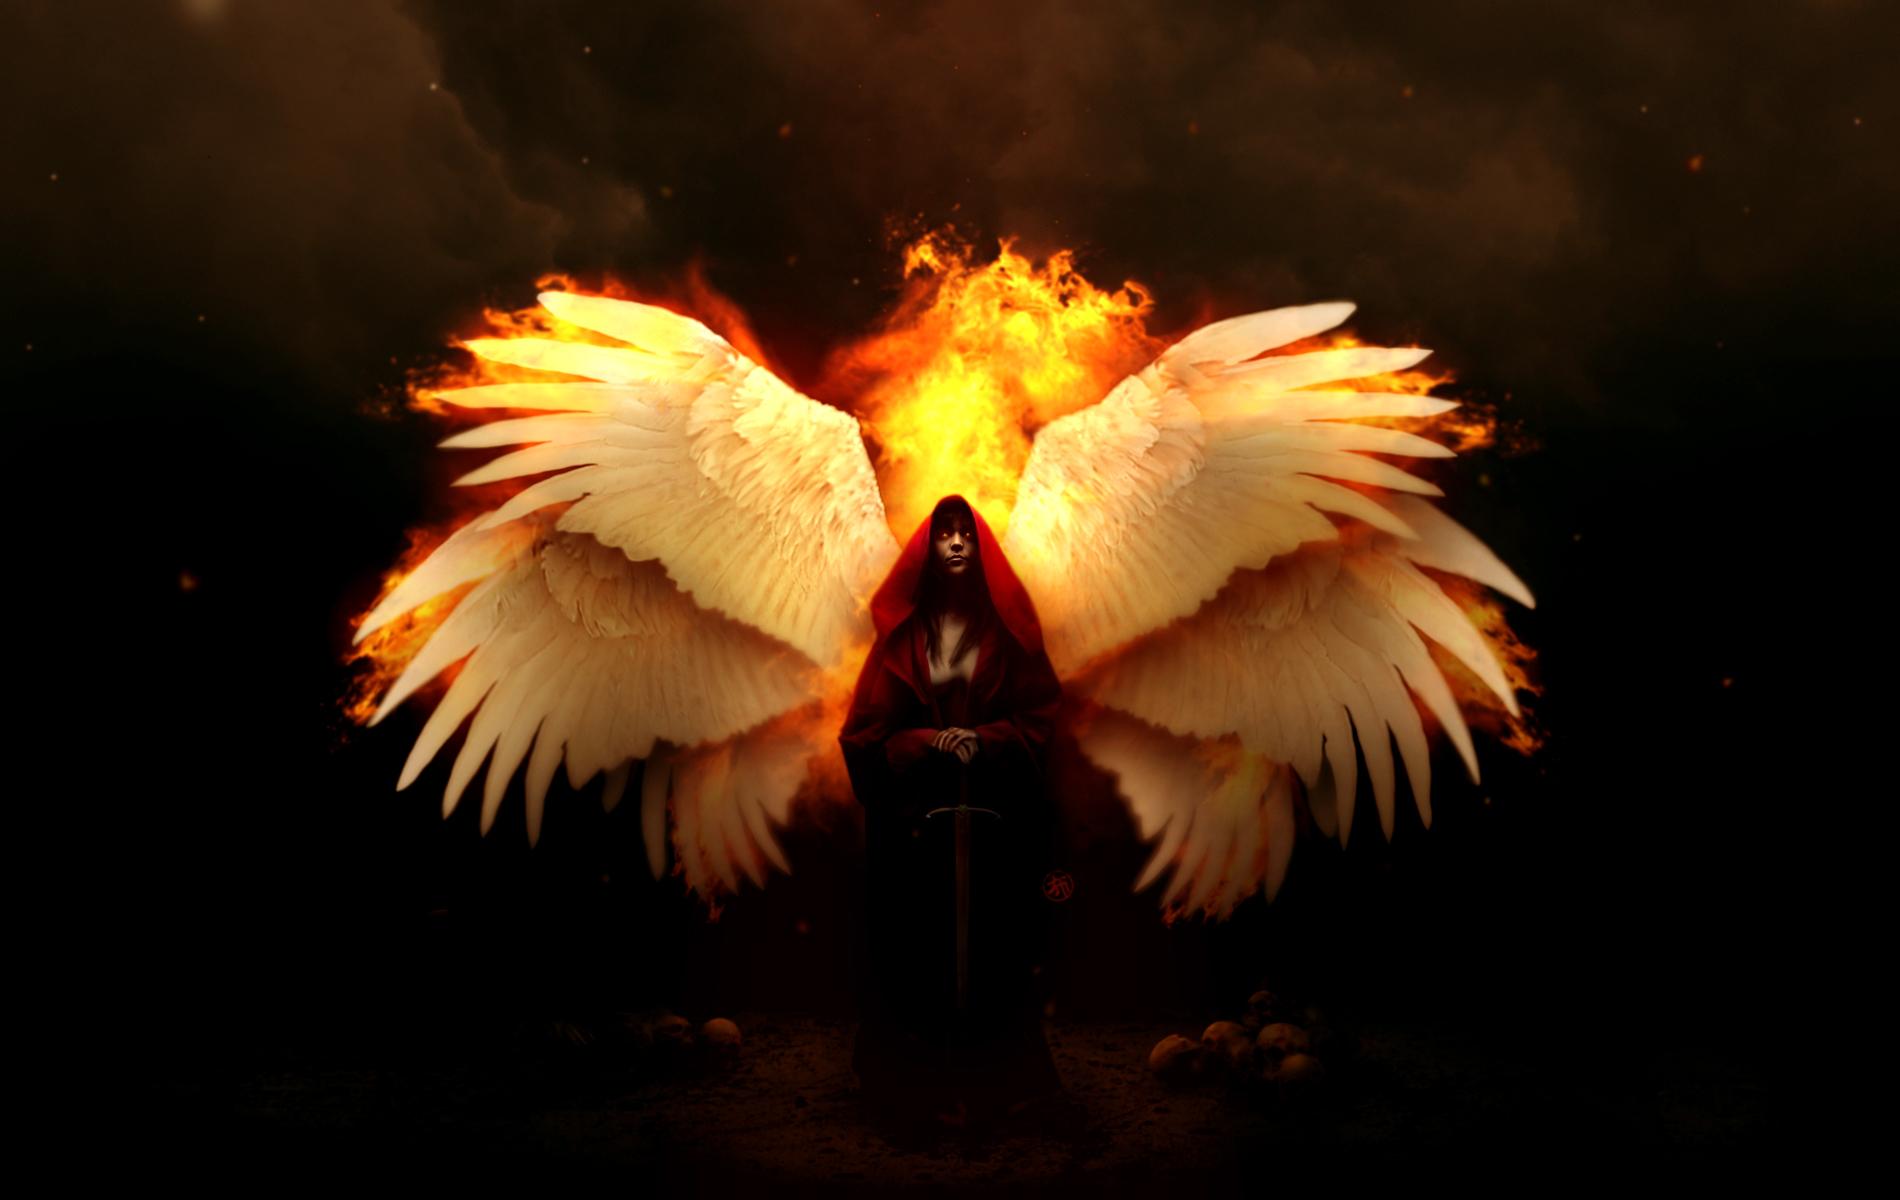 Seraphim by Satansgranny